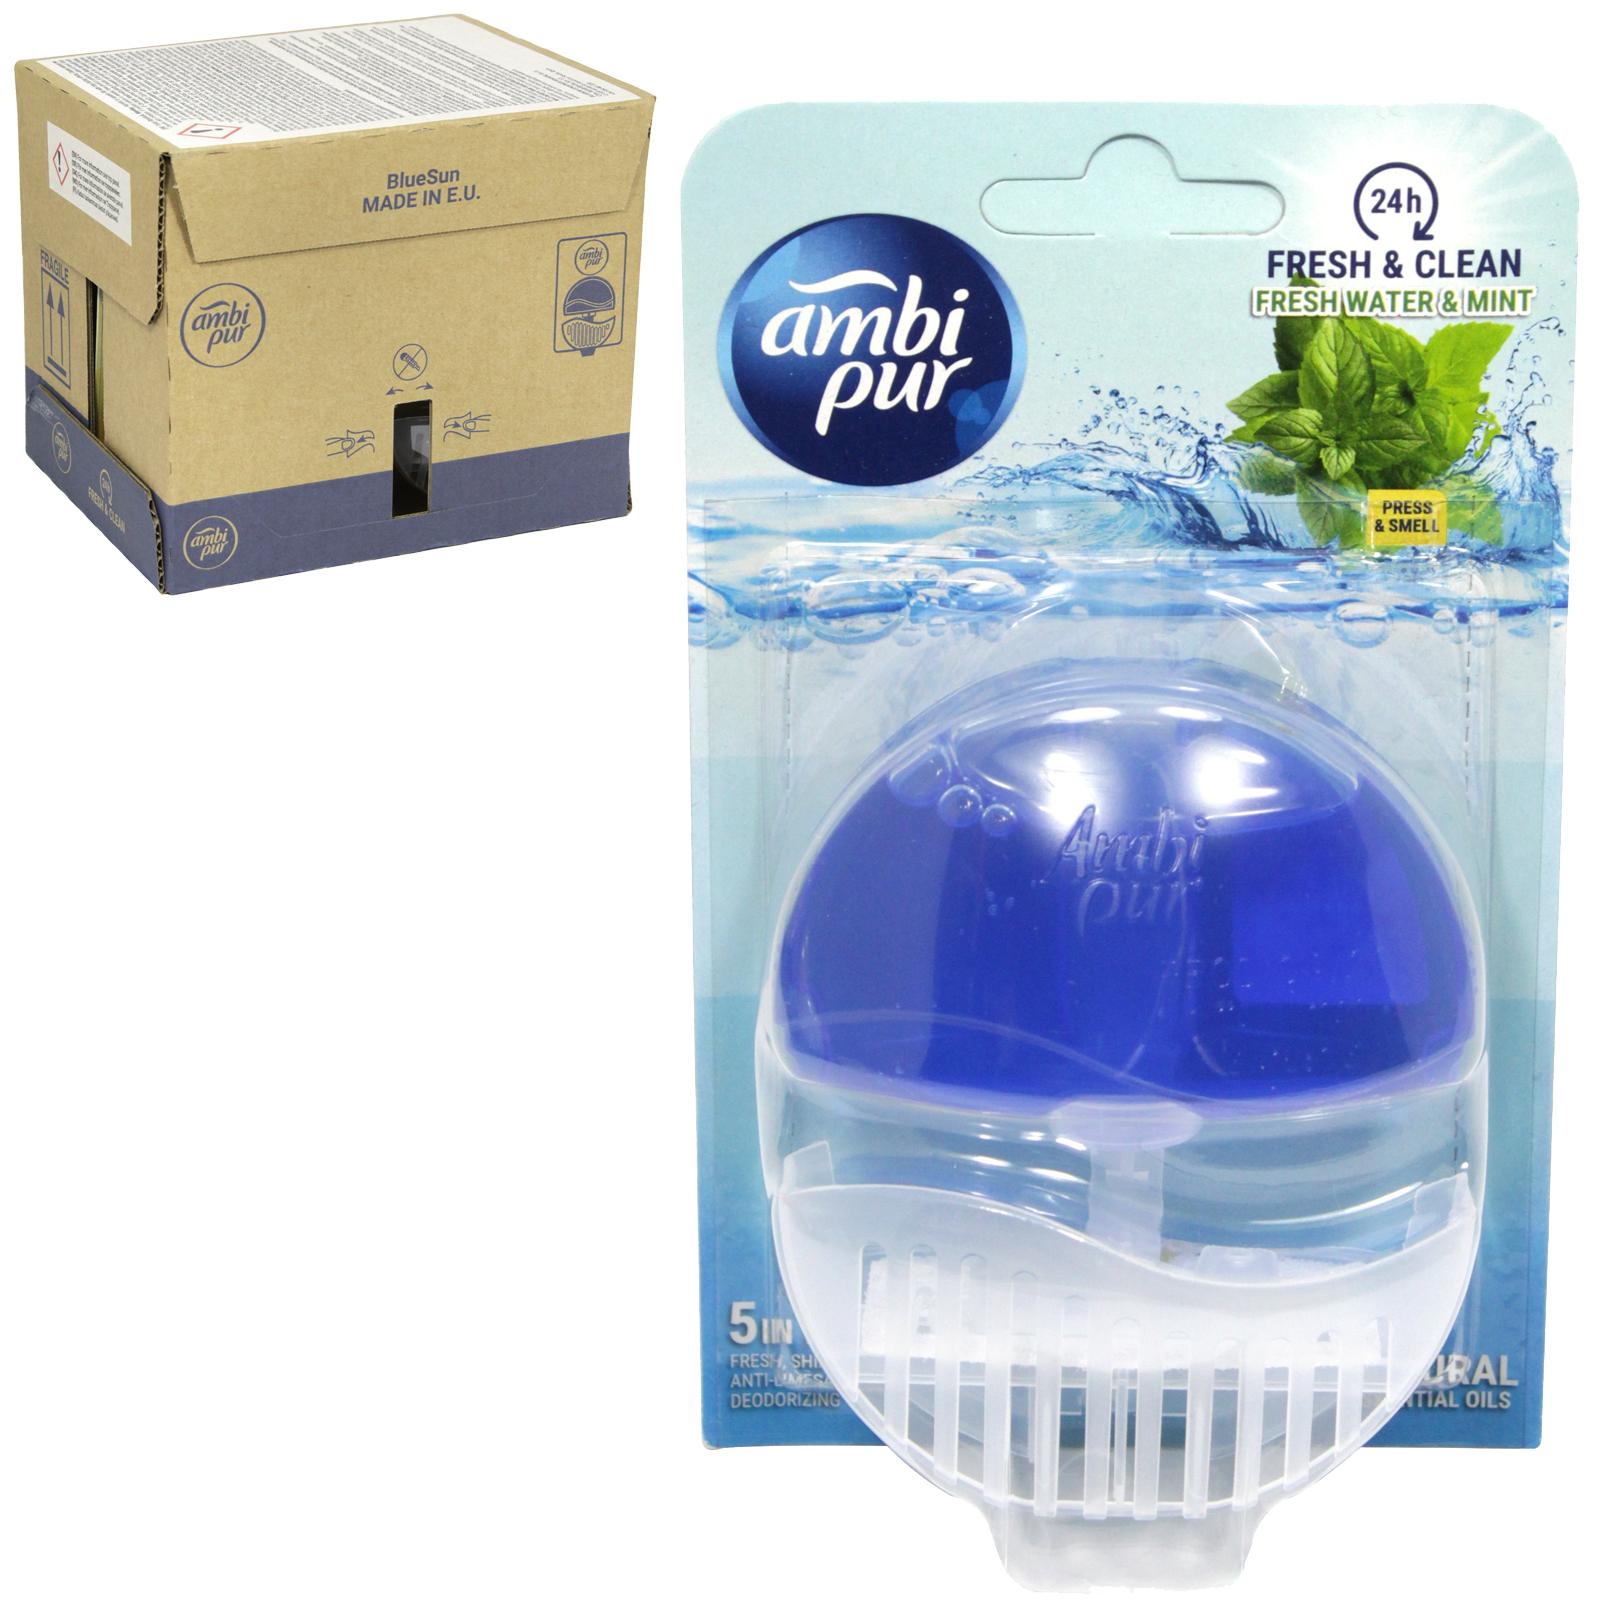 AMBI-PUR 24HR FRESH+CLEAN 5IN1 LIQUID RIM BLOCK 55ML FRESH WATER+MINT X6